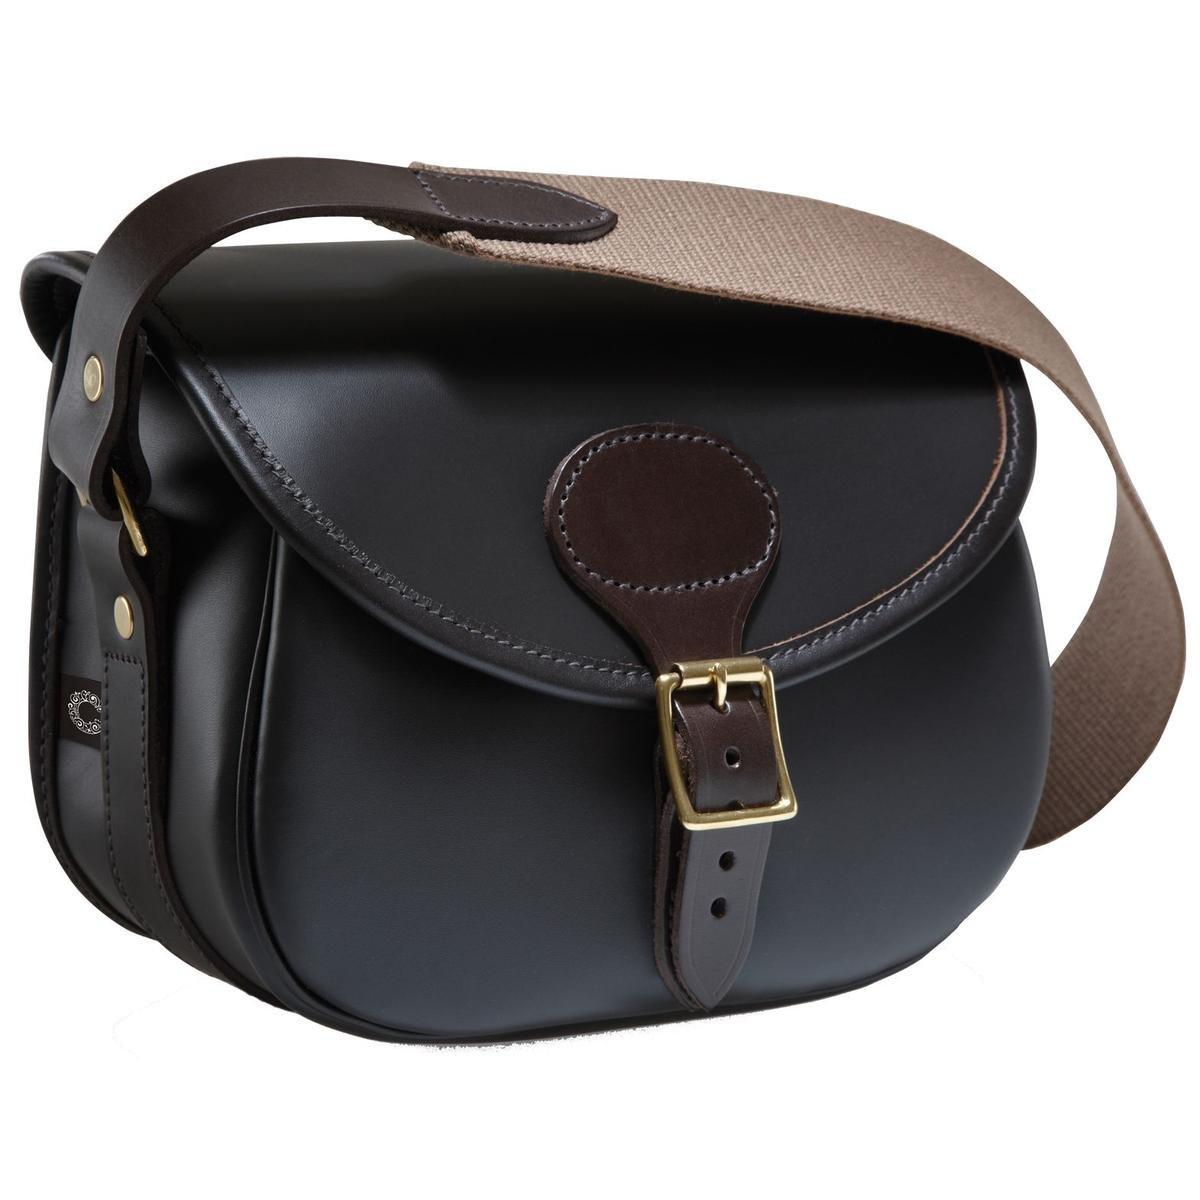 Croots Cartridge Bag 100 Byland Leather